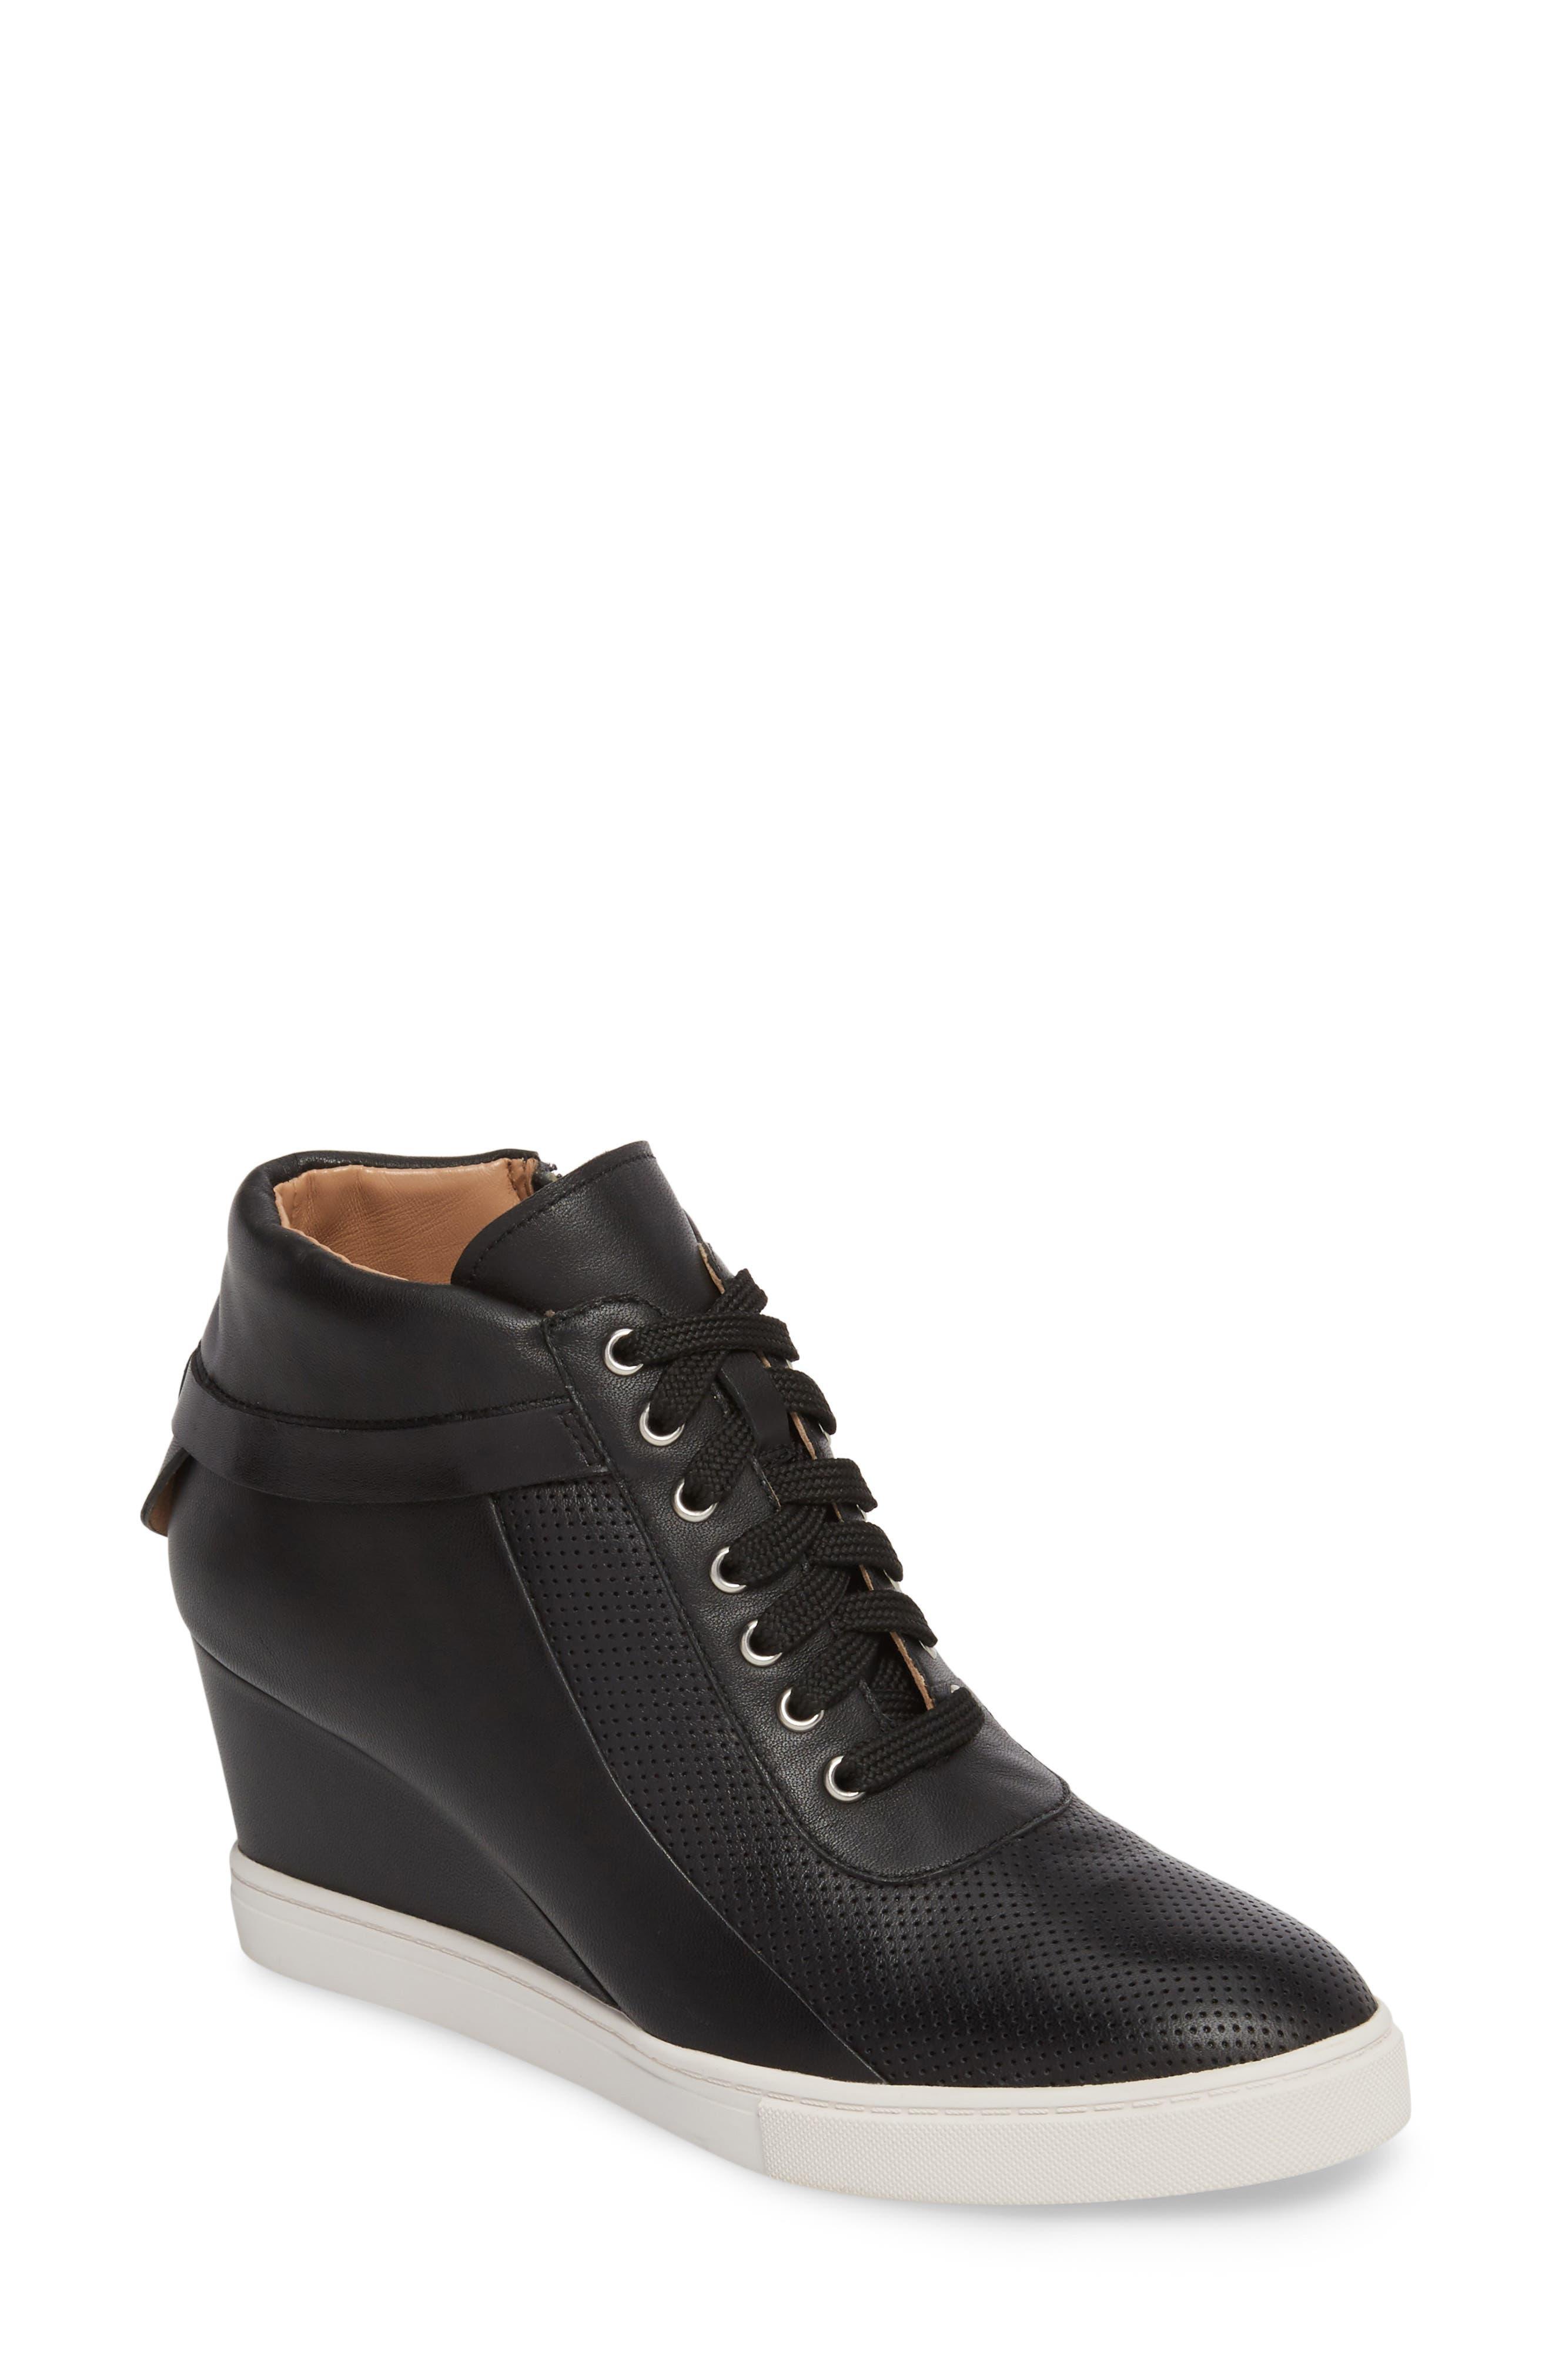 Freja Wedge Sneaker,                             Main thumbnail 1, color,                             BLACK LEATHER